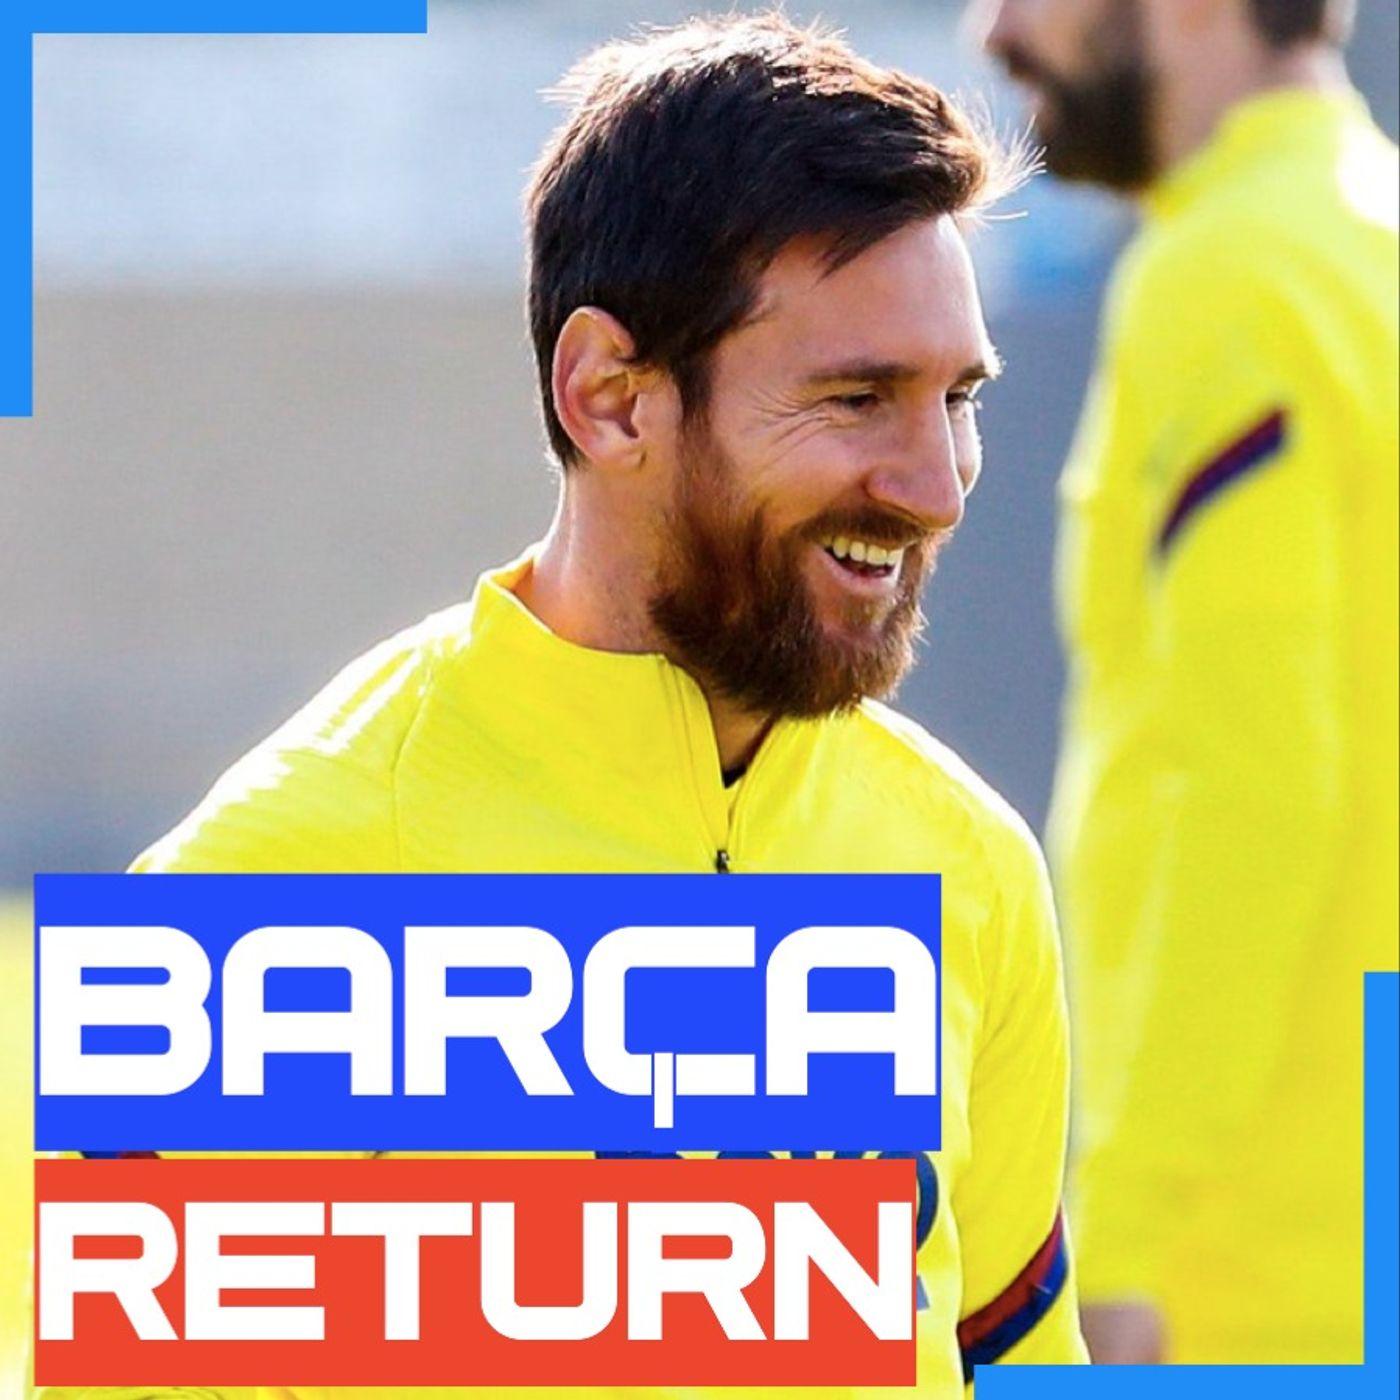 Barça's return plan, Lautaro Martínez, and Frenkie de Jong with Sam Marsden